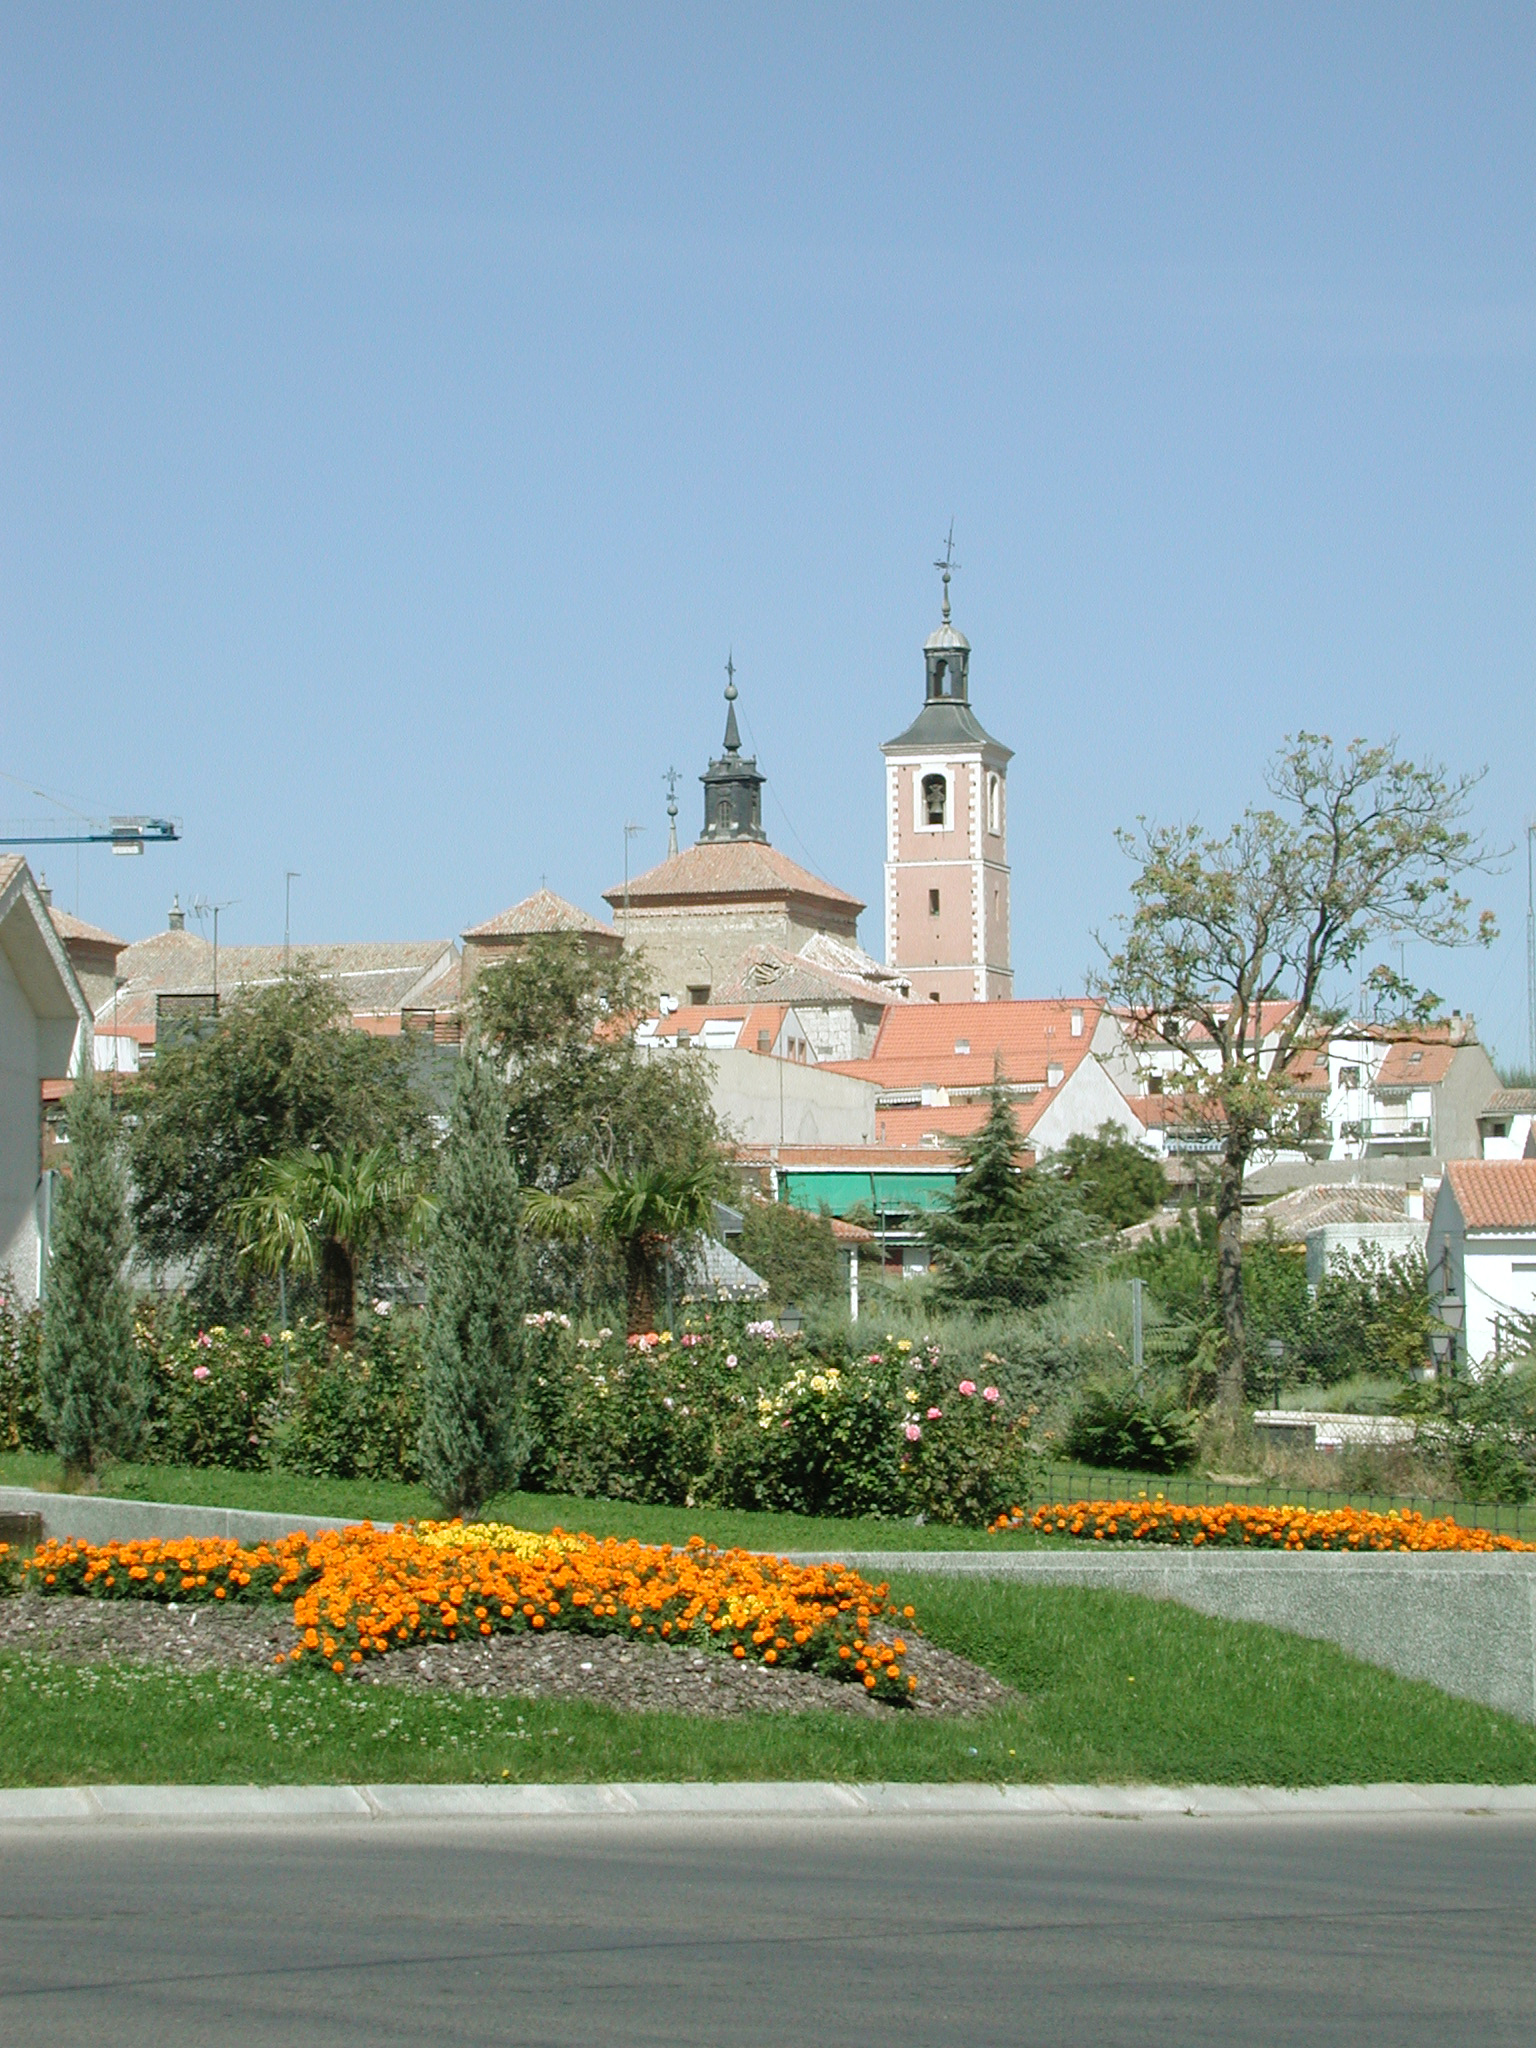 Vista de Valdemoro con iglesia al fondo